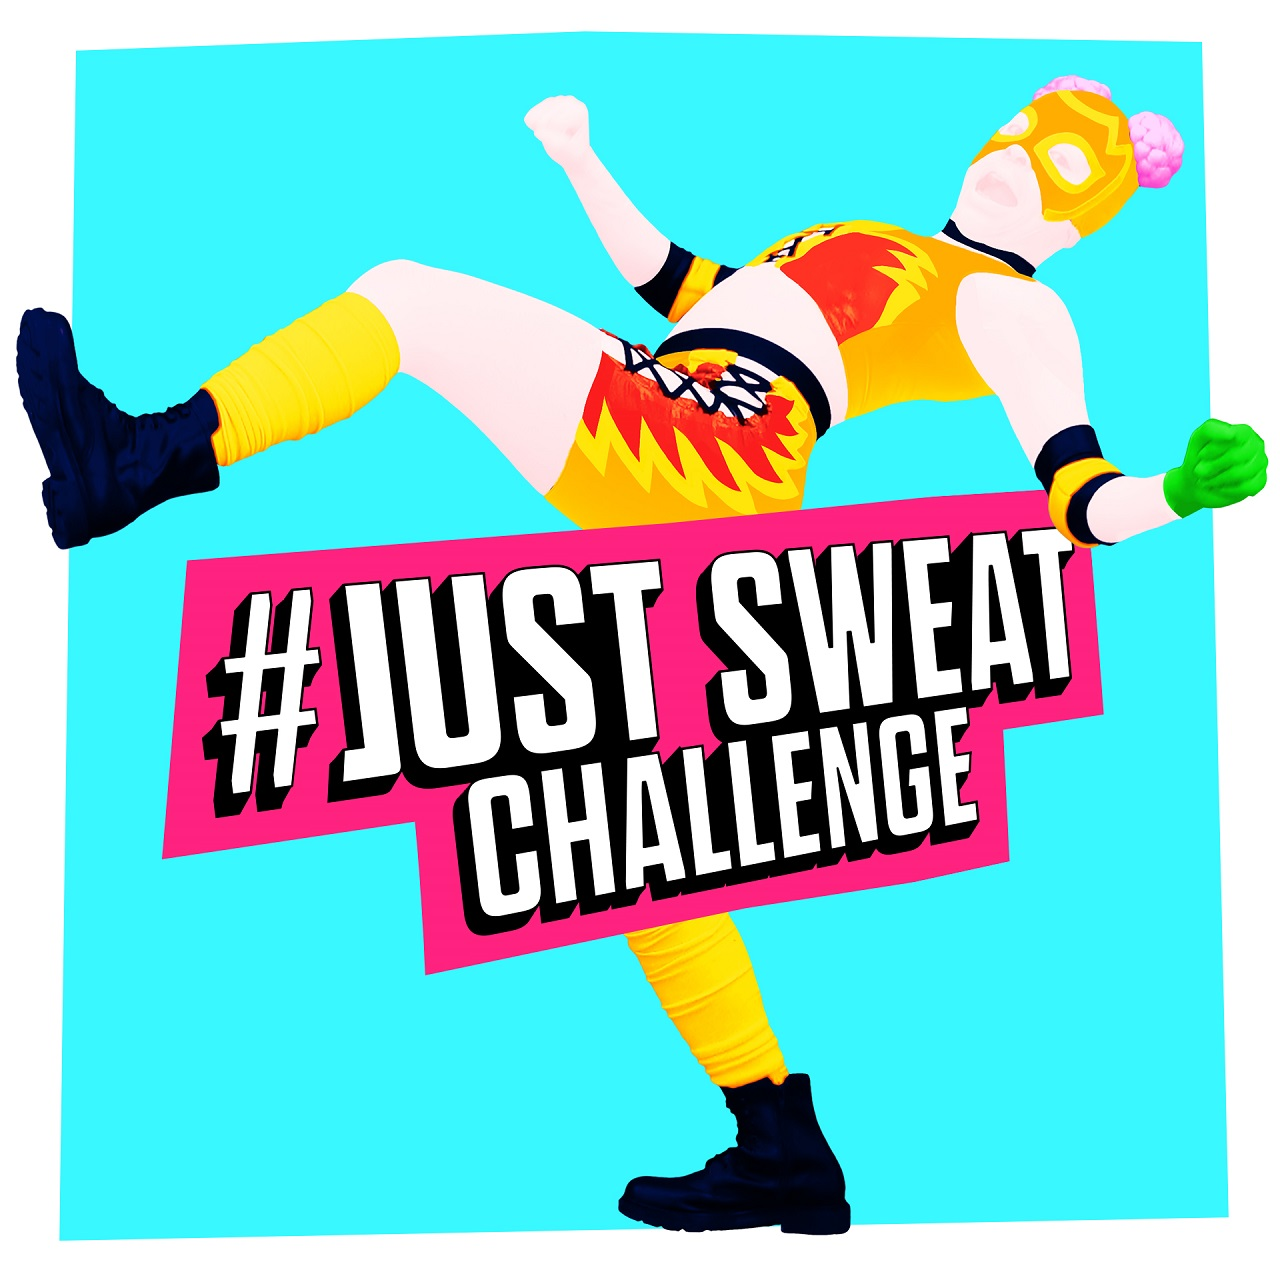 Just Sweat Challenge